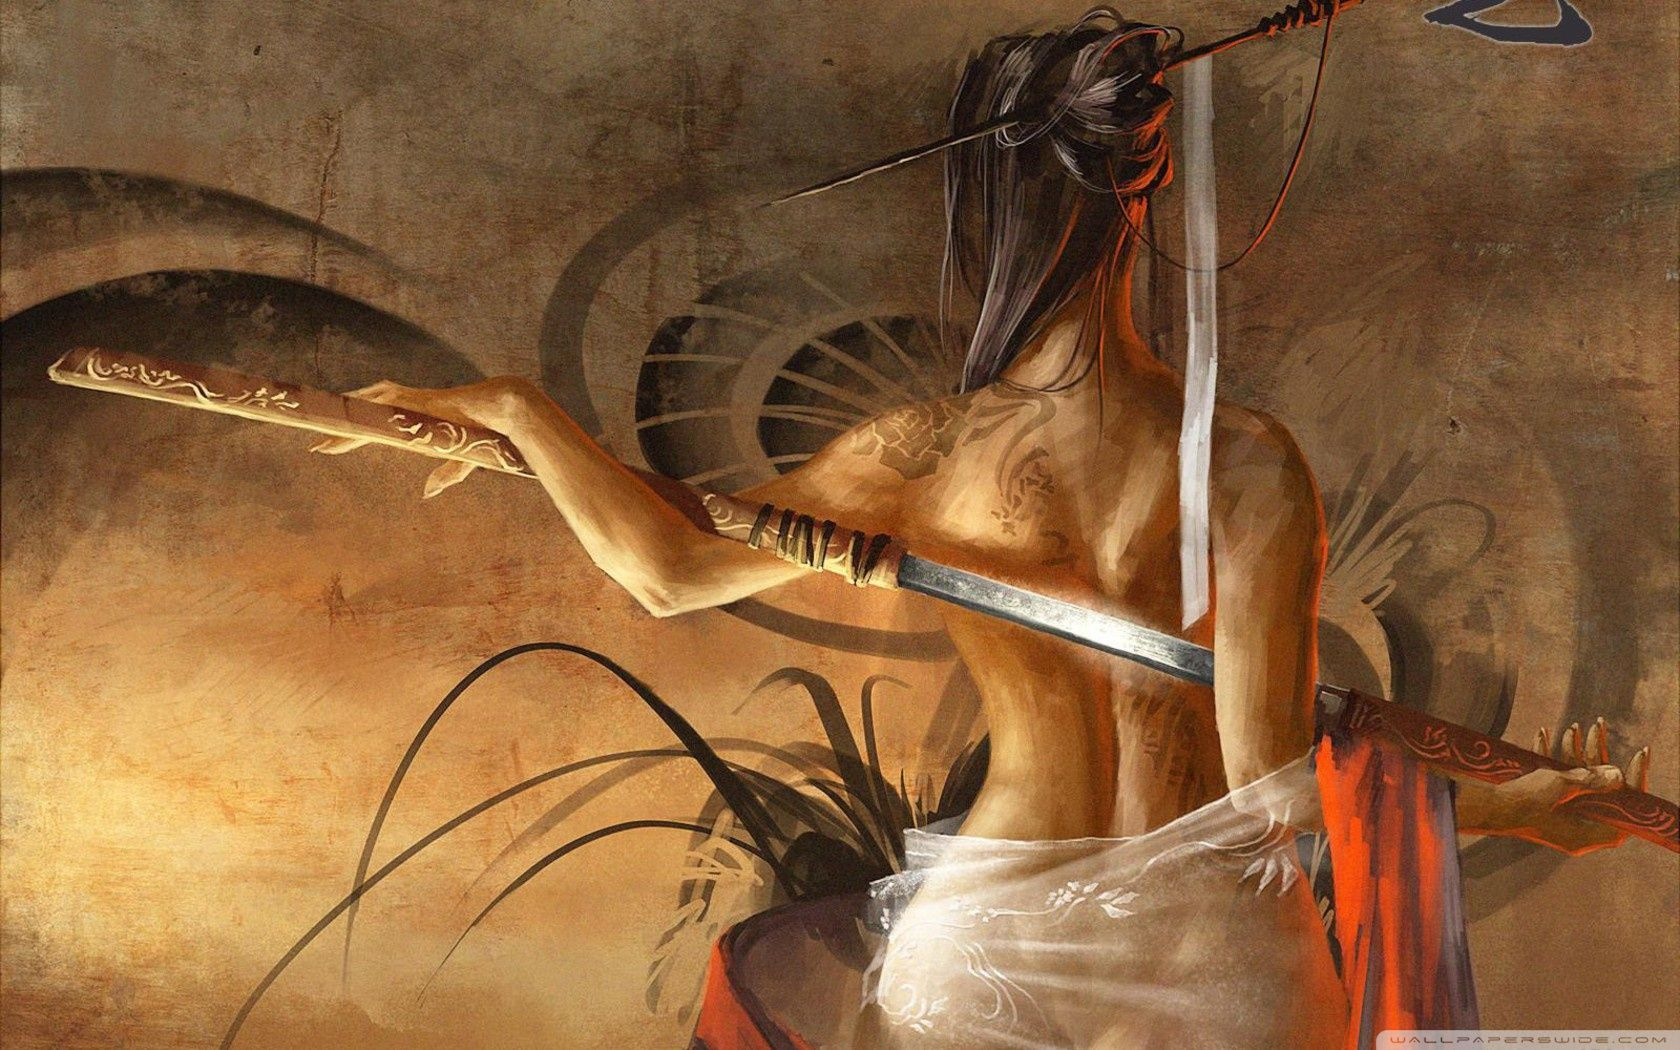 Pubg Trenchcoat Girl 4k Hd Games 4k Wallpapers Images: Top Free Samurai Art Backgrounds